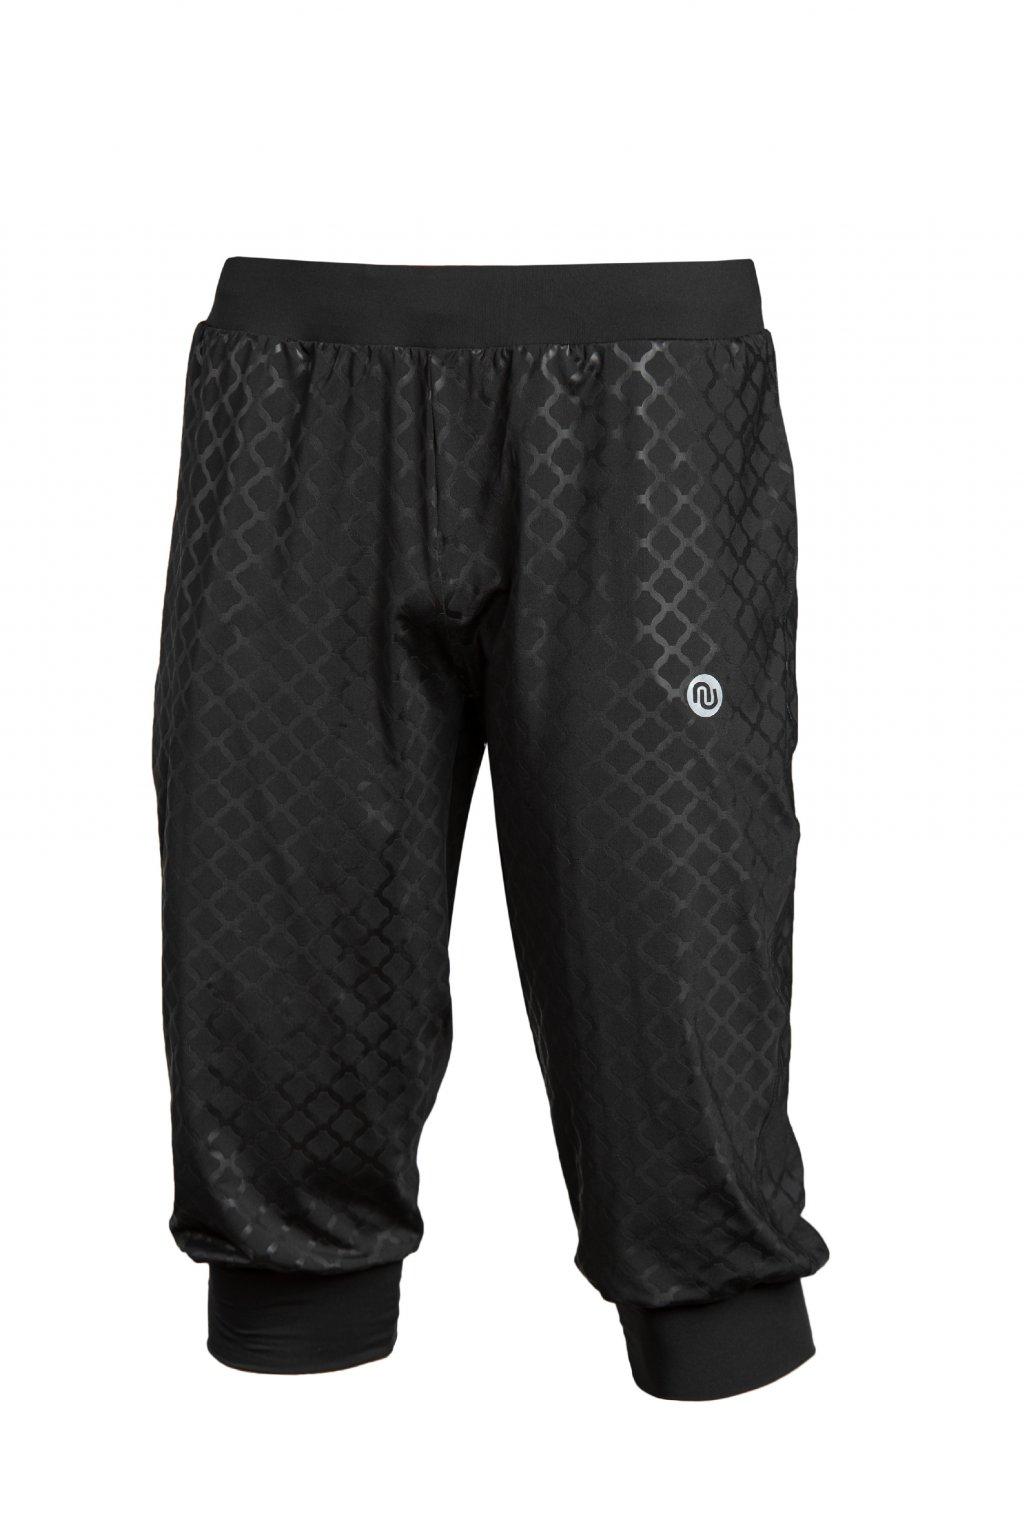 Volné kalhoty 3 4 shiny black sdmc3 90T 1